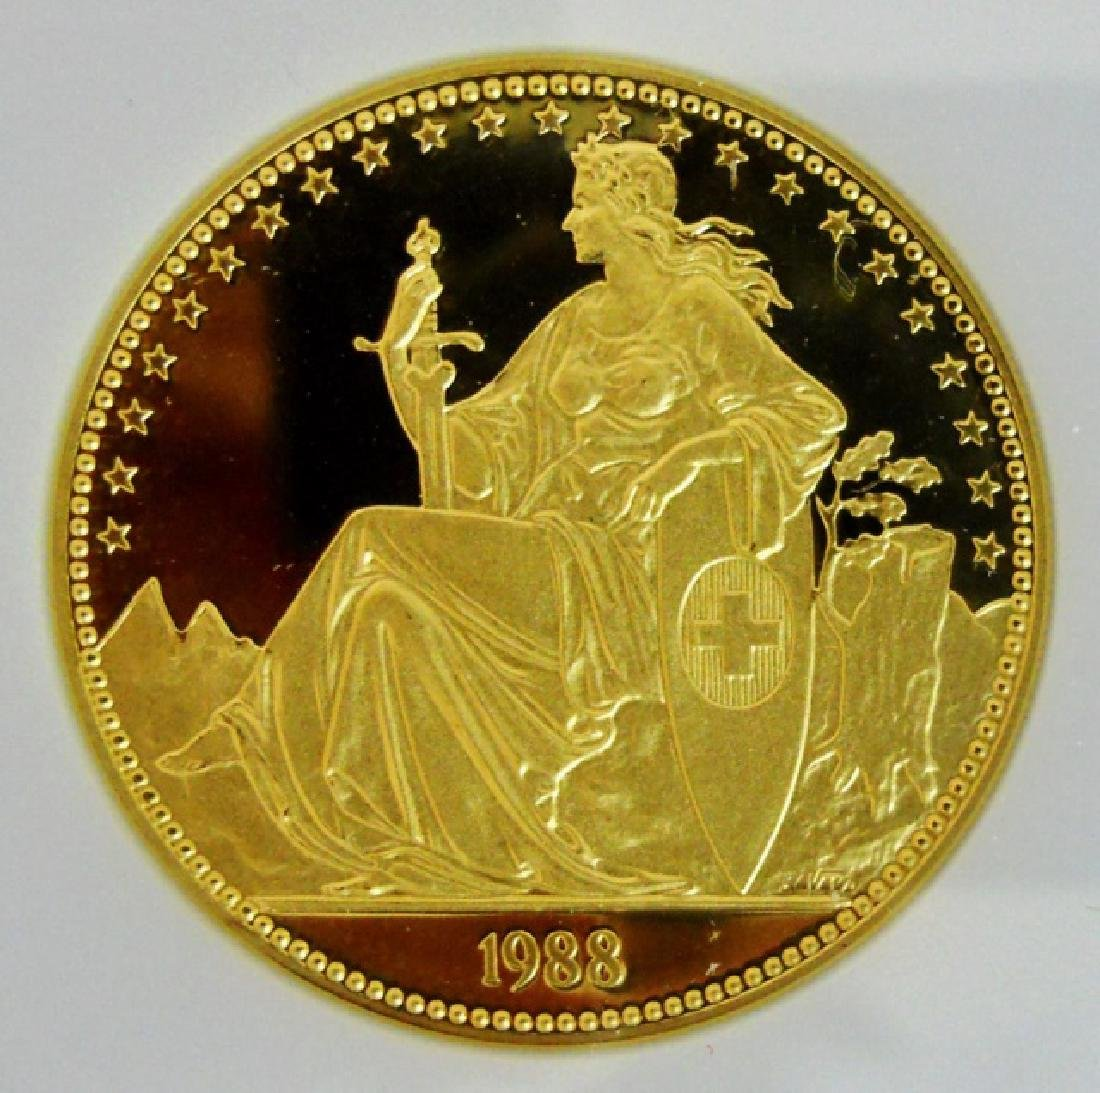 Swiss 1988 Lion of Luzanne Gold Proof Set (4pc) - 2